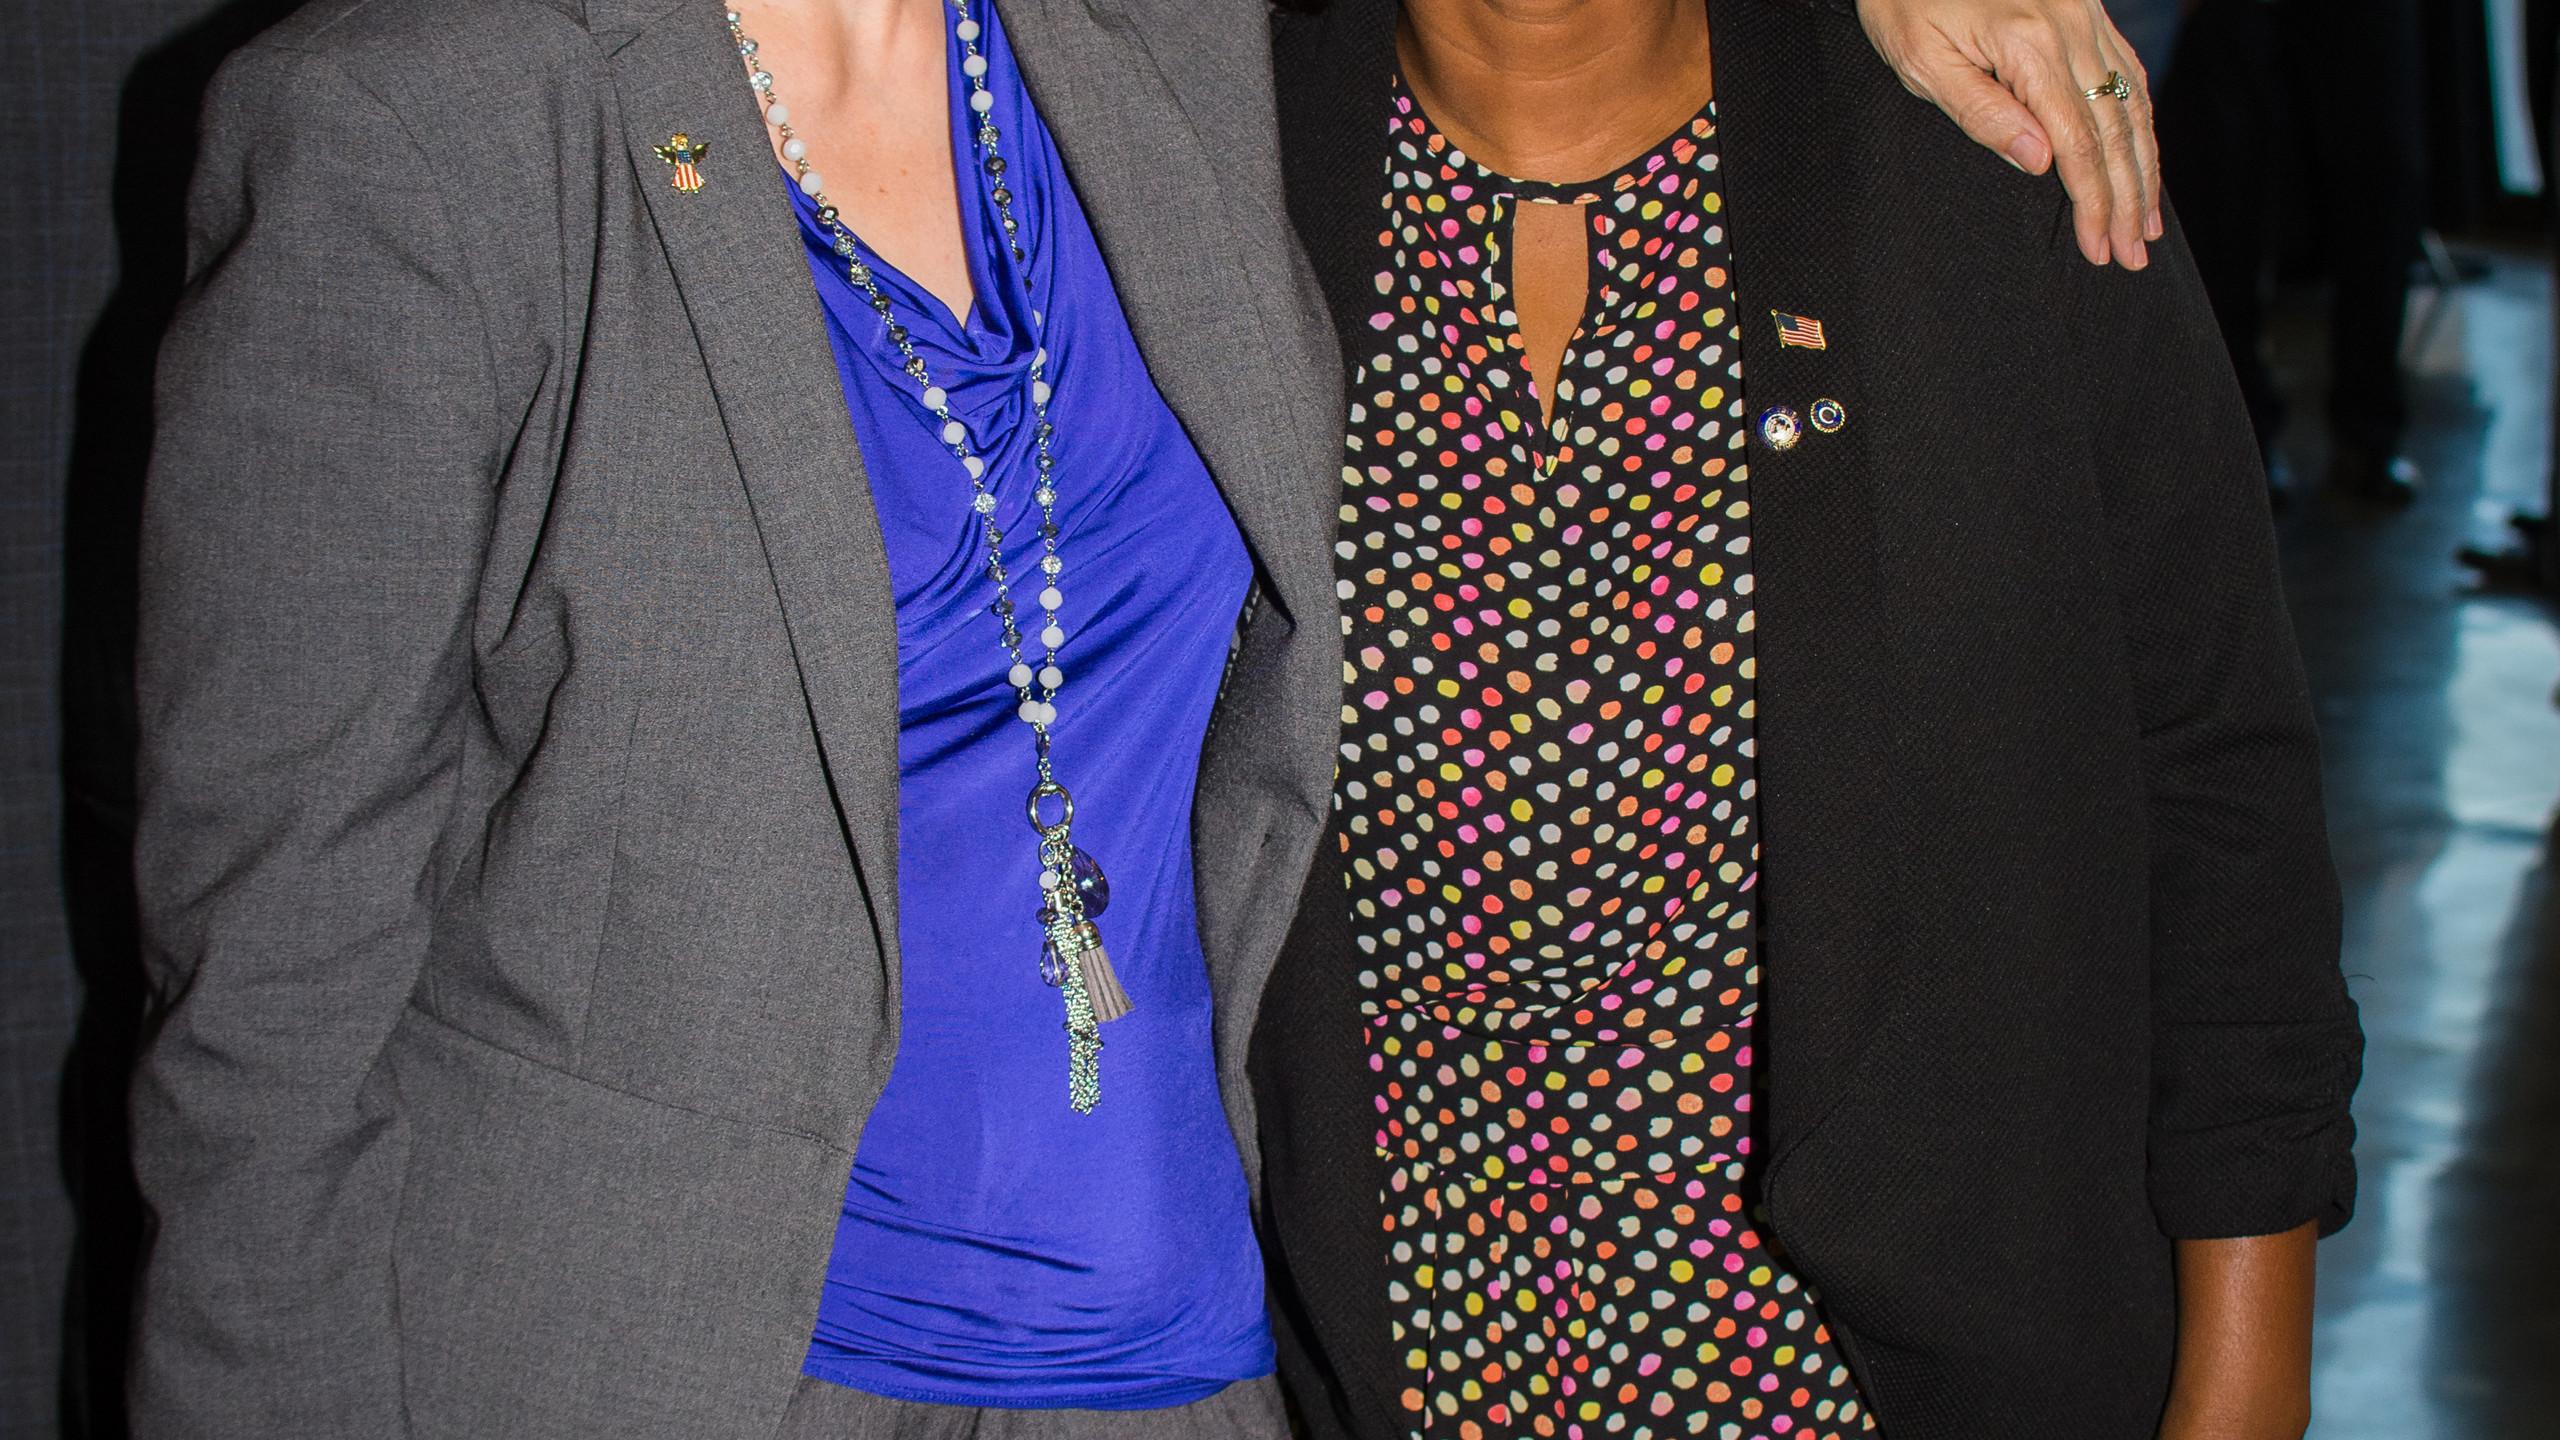 Cindy Summers and Corinthia Elder